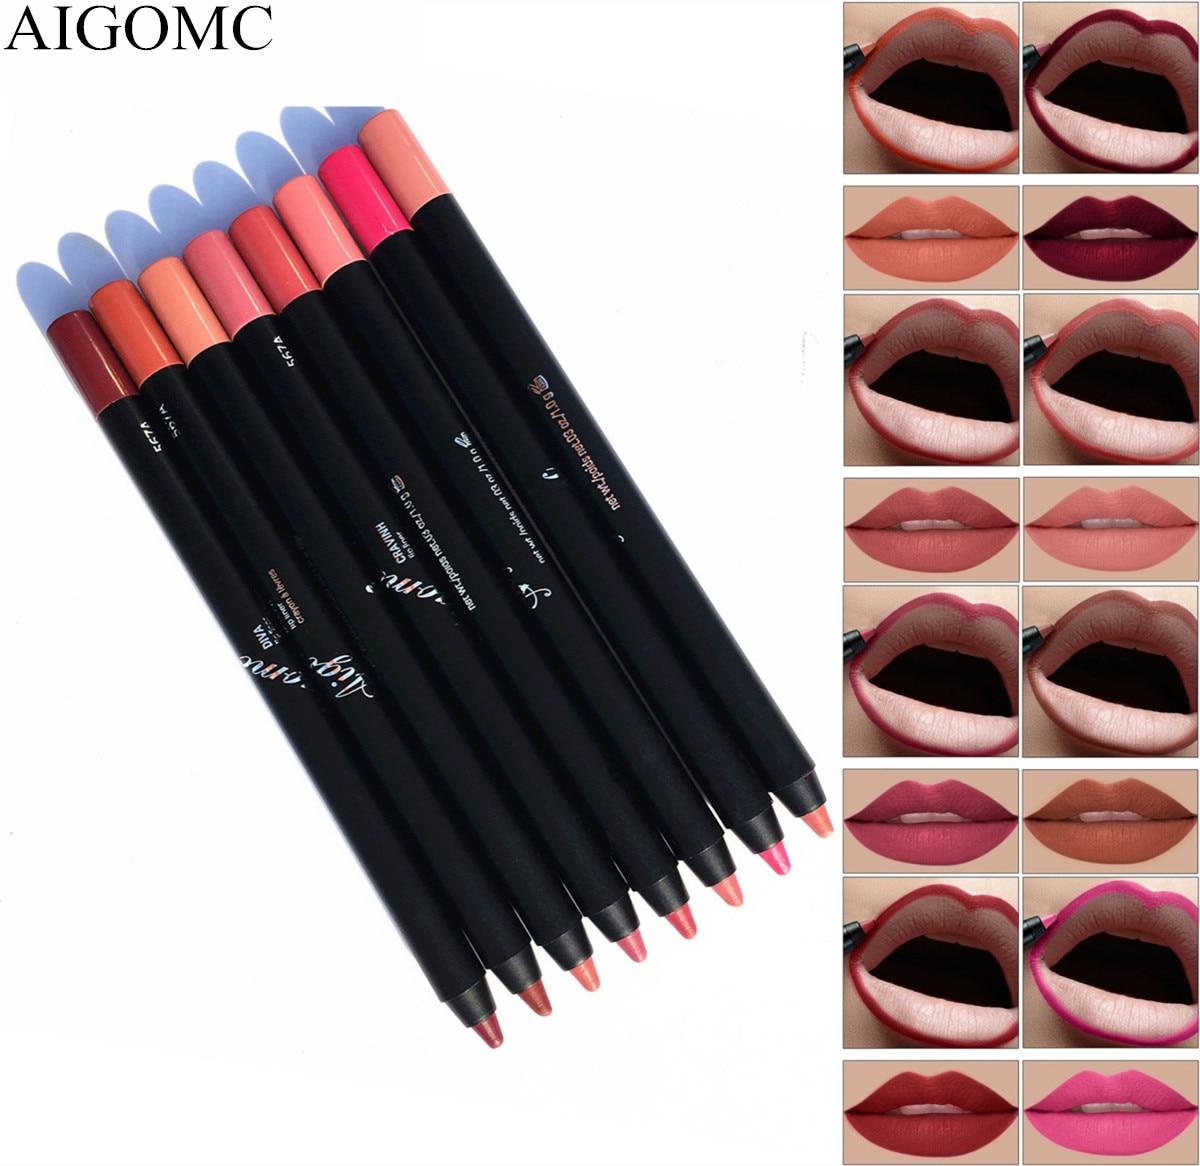 AIGOMC 8 Colors/Set waterproof lip liner pencil sexy full lipstick female long-lasting lipstick cosmetics beauty makeup